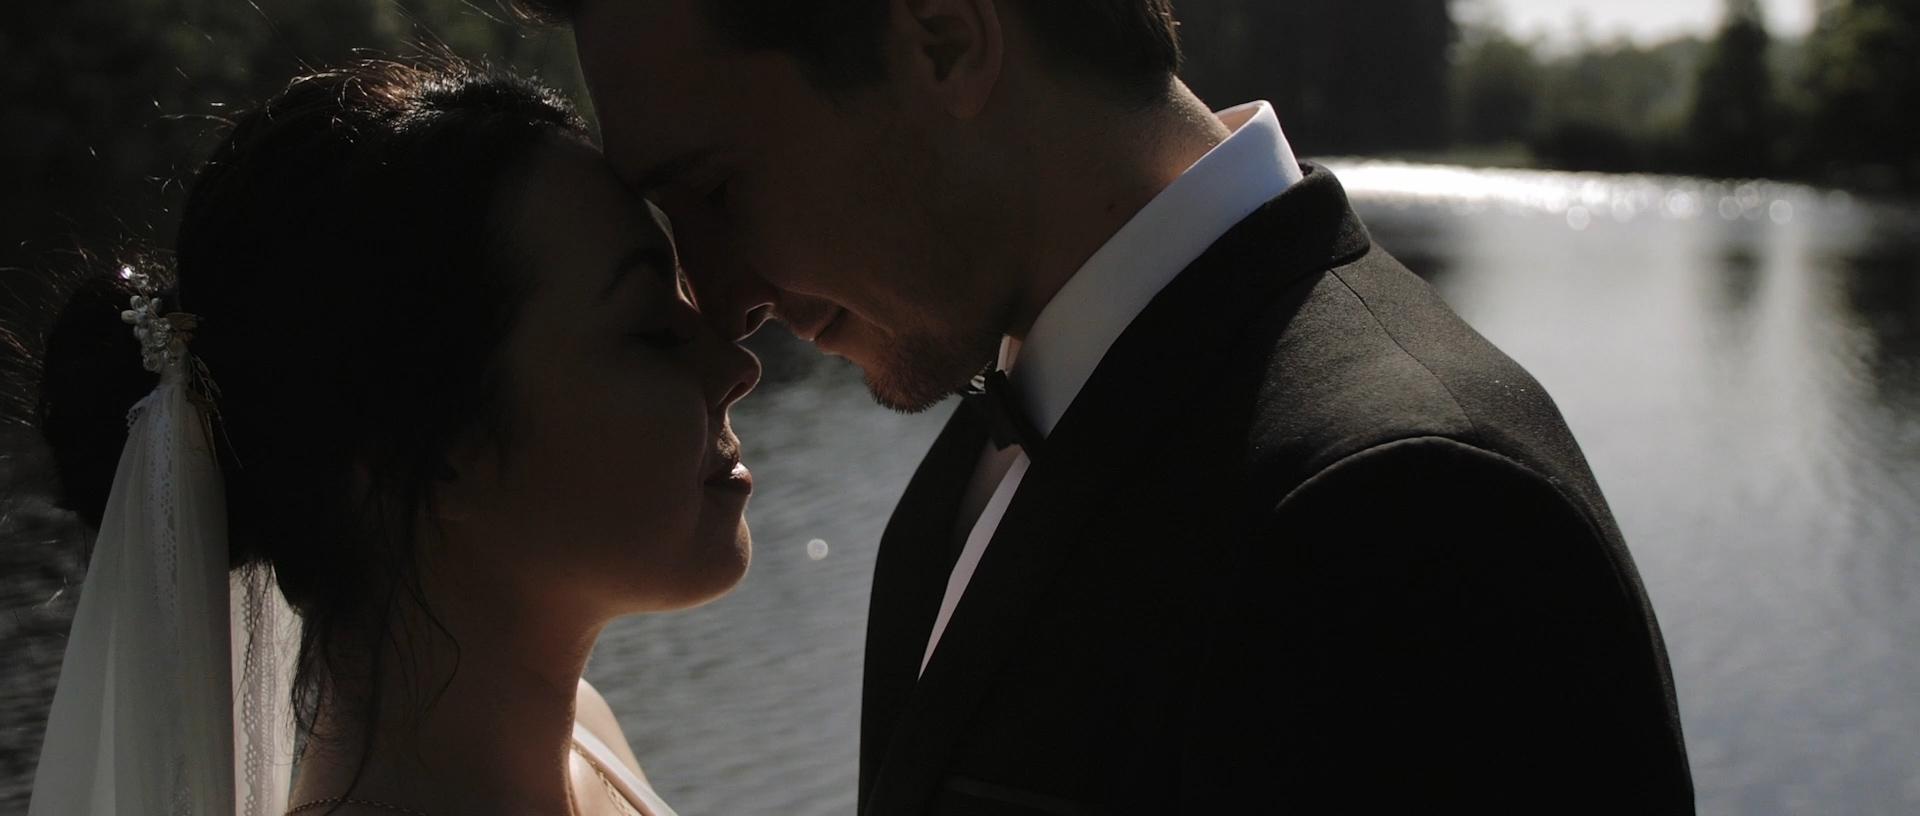 st-andrews-wedding-videographer_LL_07.jpg